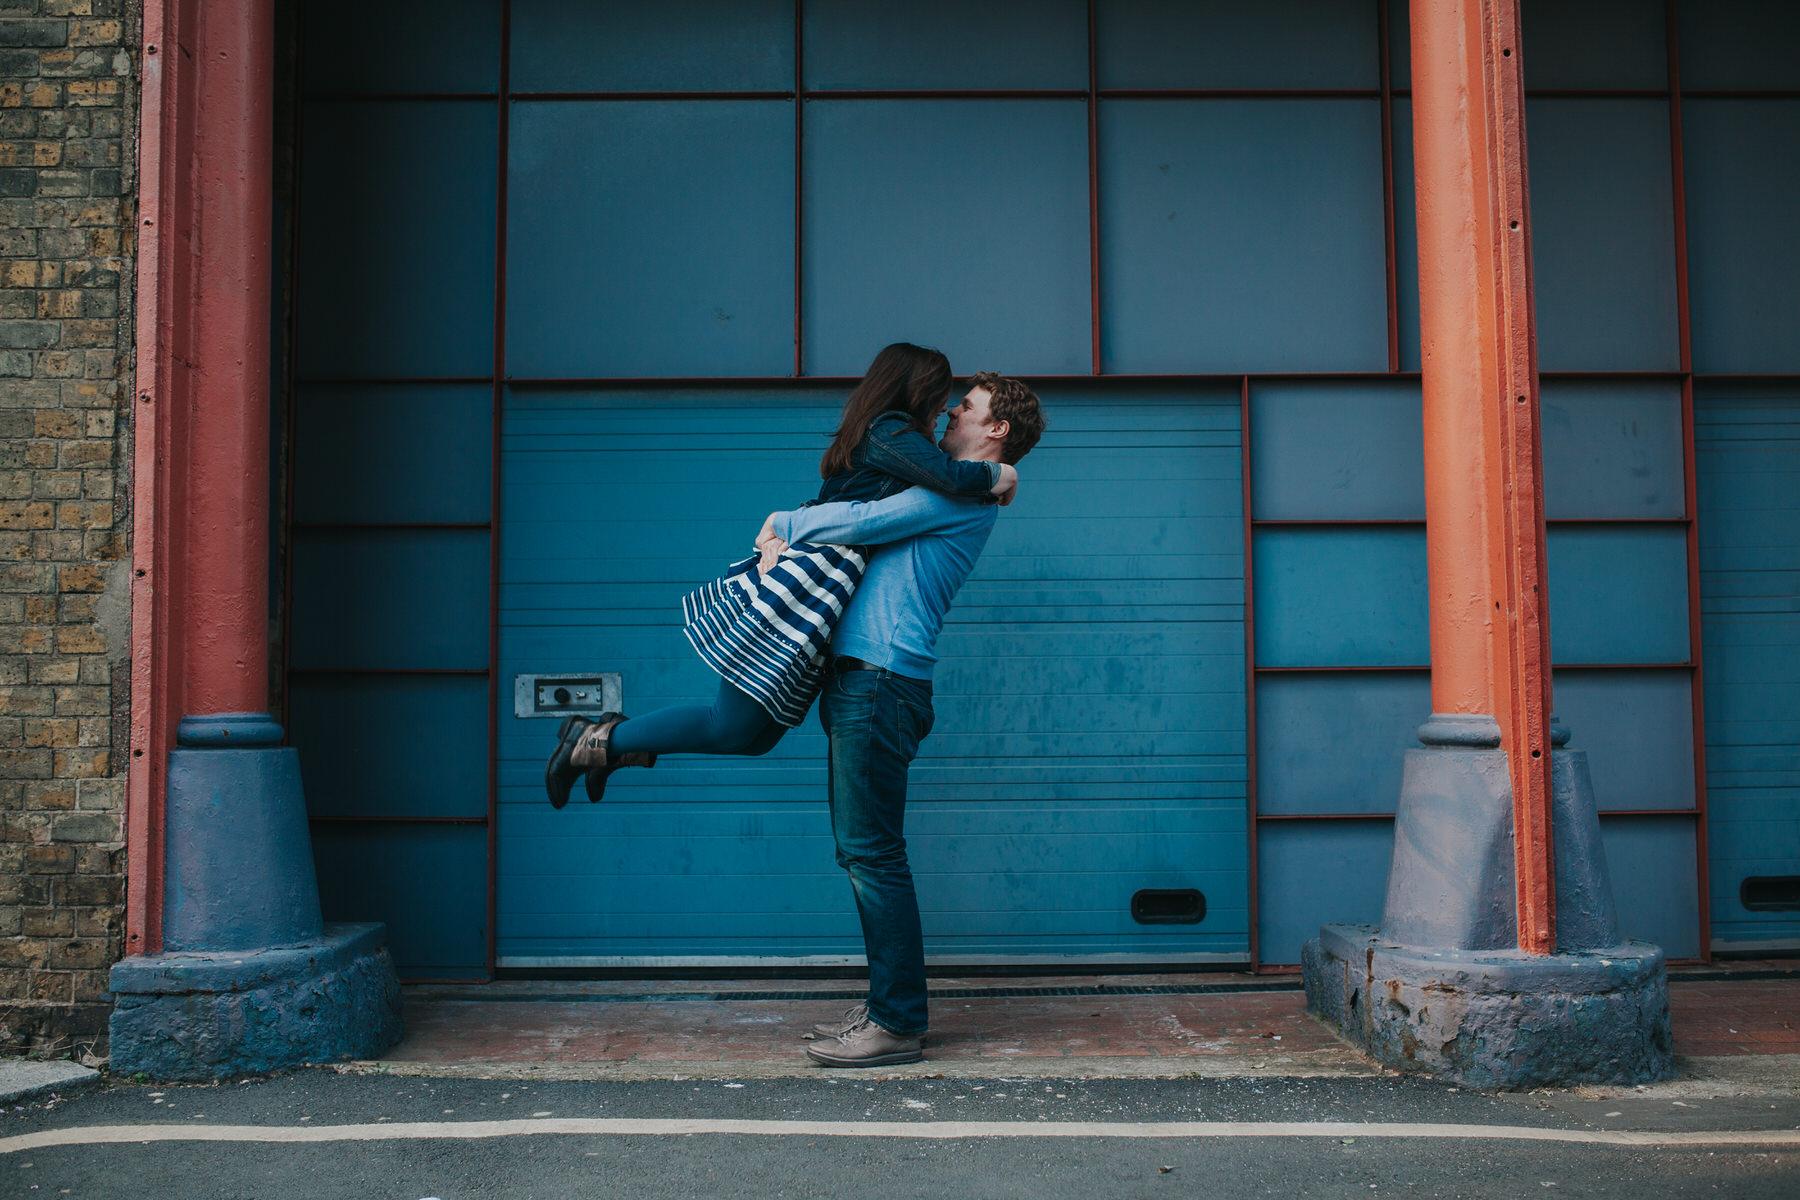 66-Quirky-engagement-London-swing-girlfriend-around.jpg